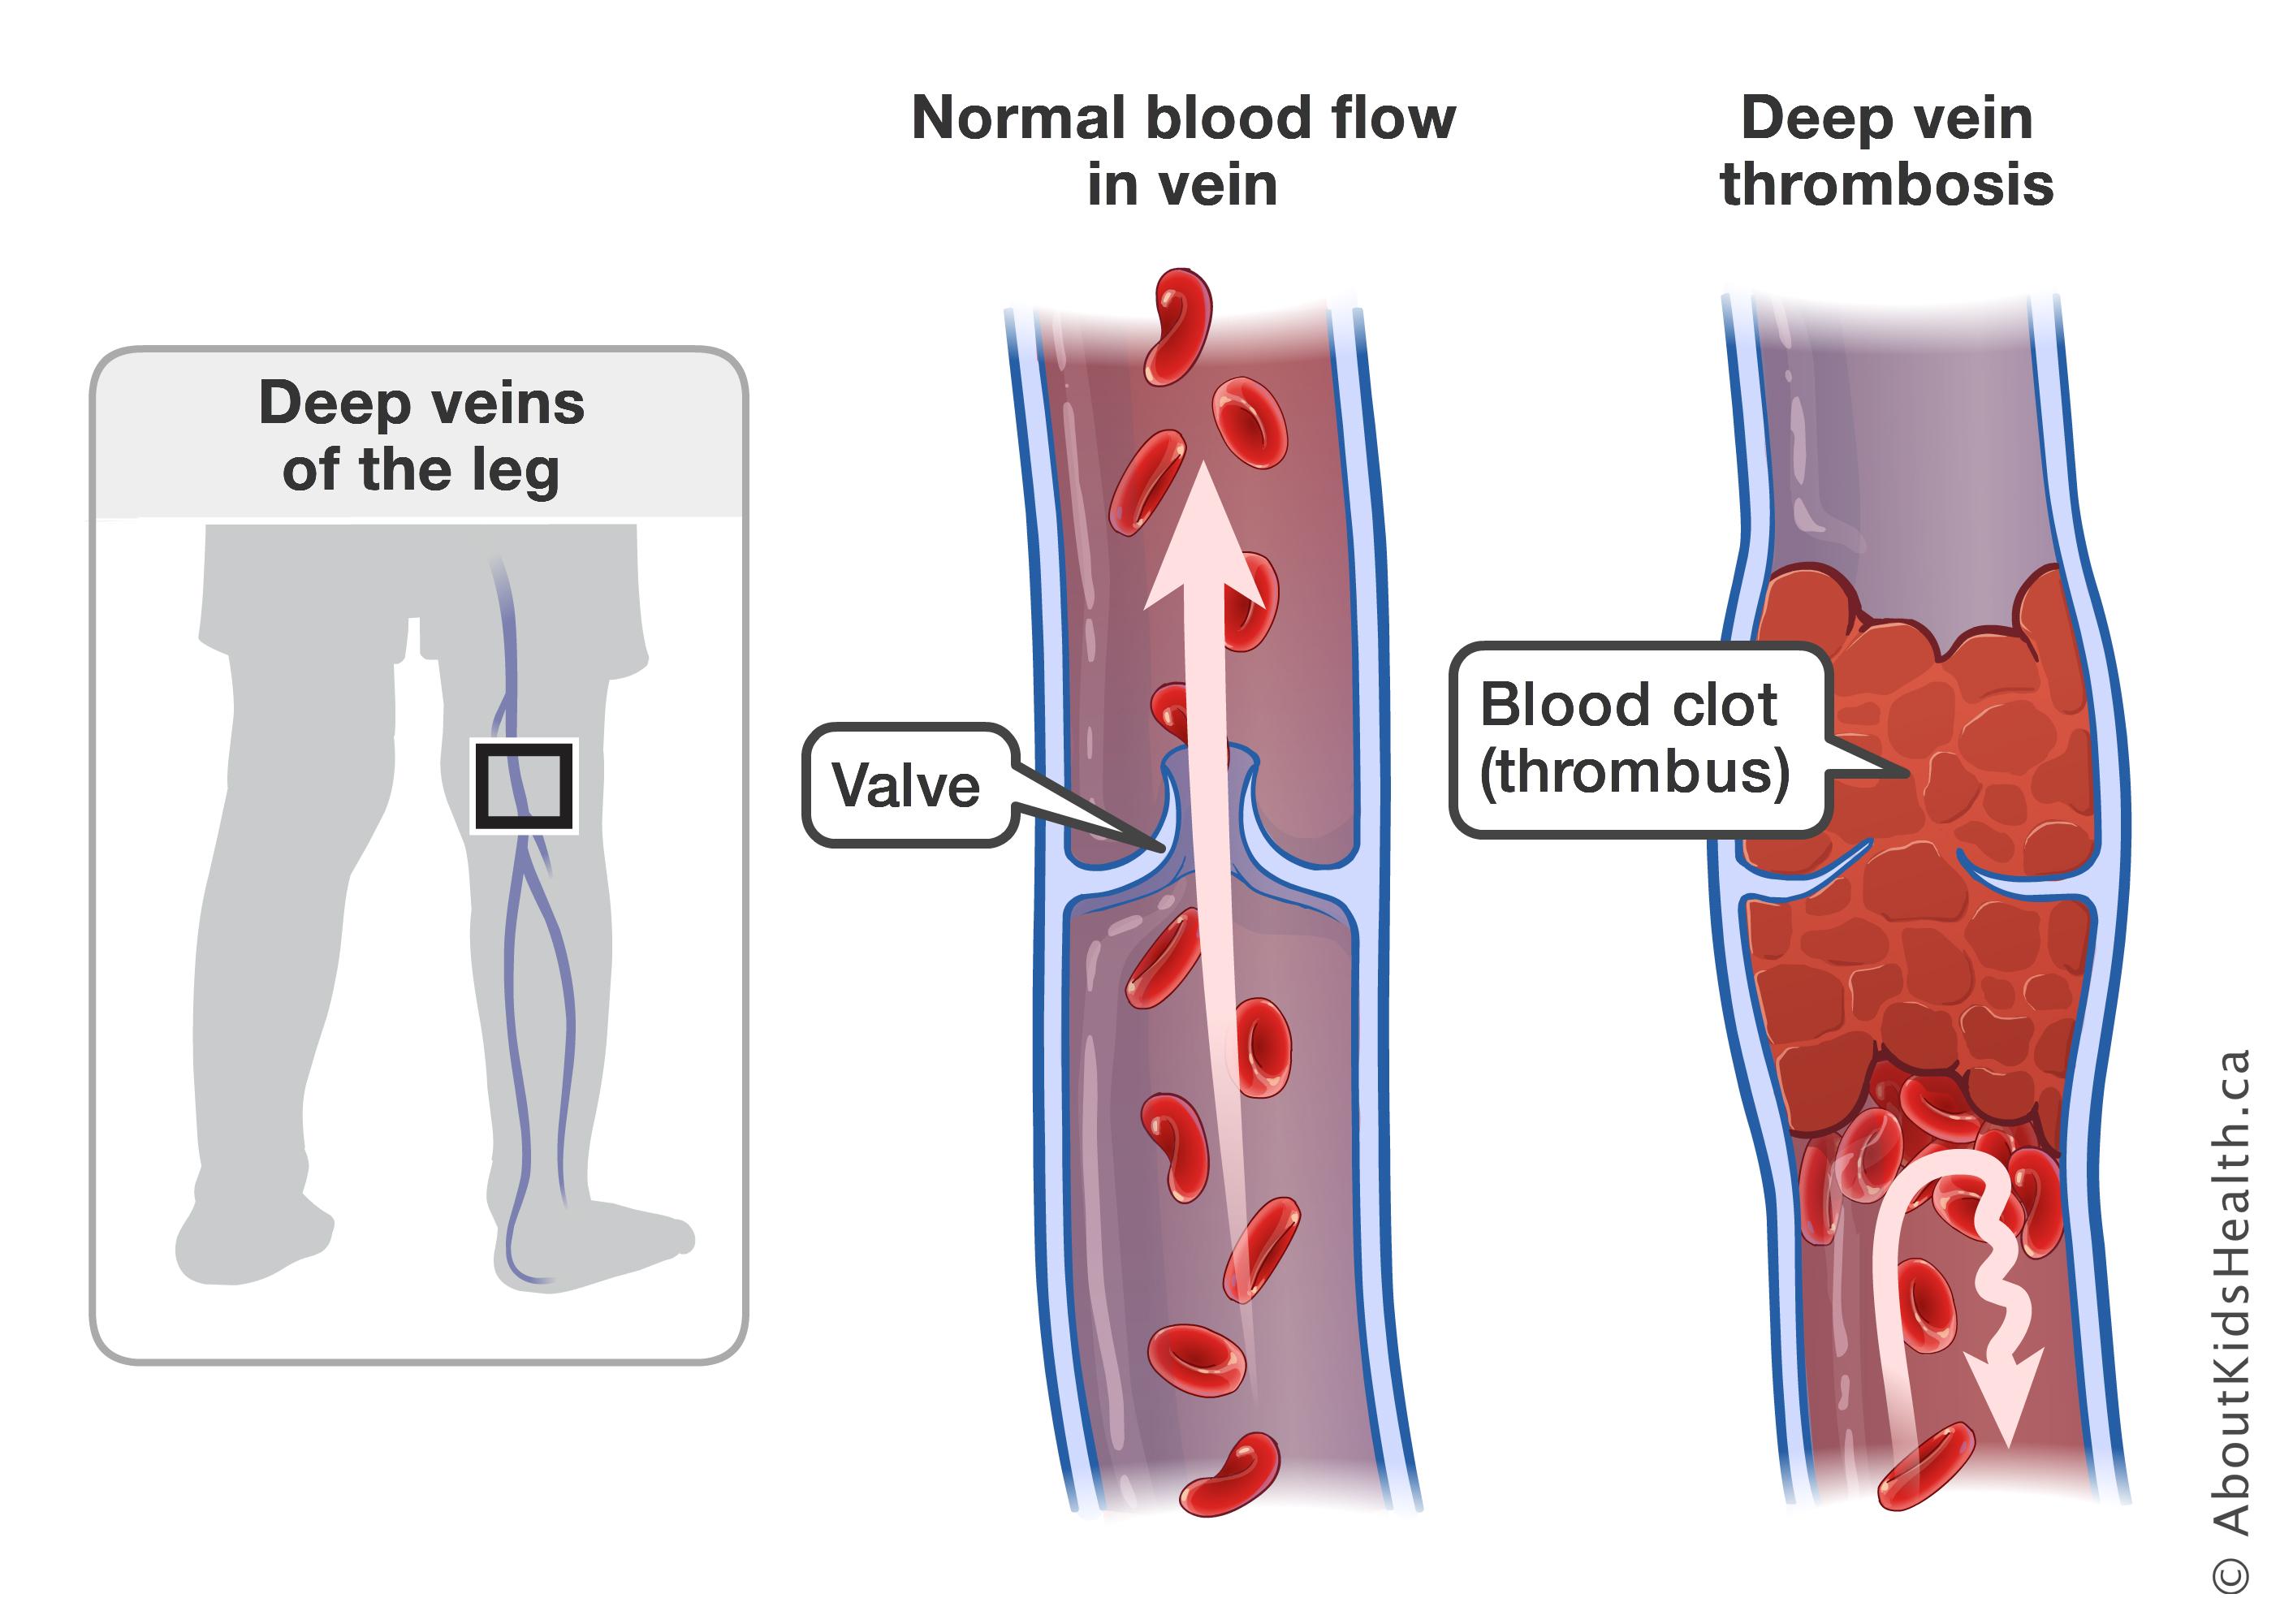 diagram of veins in wrist babies wiring diagram paper deep vein thrombosis diagram of veins in [ 2808 x 2000 Pixel ]